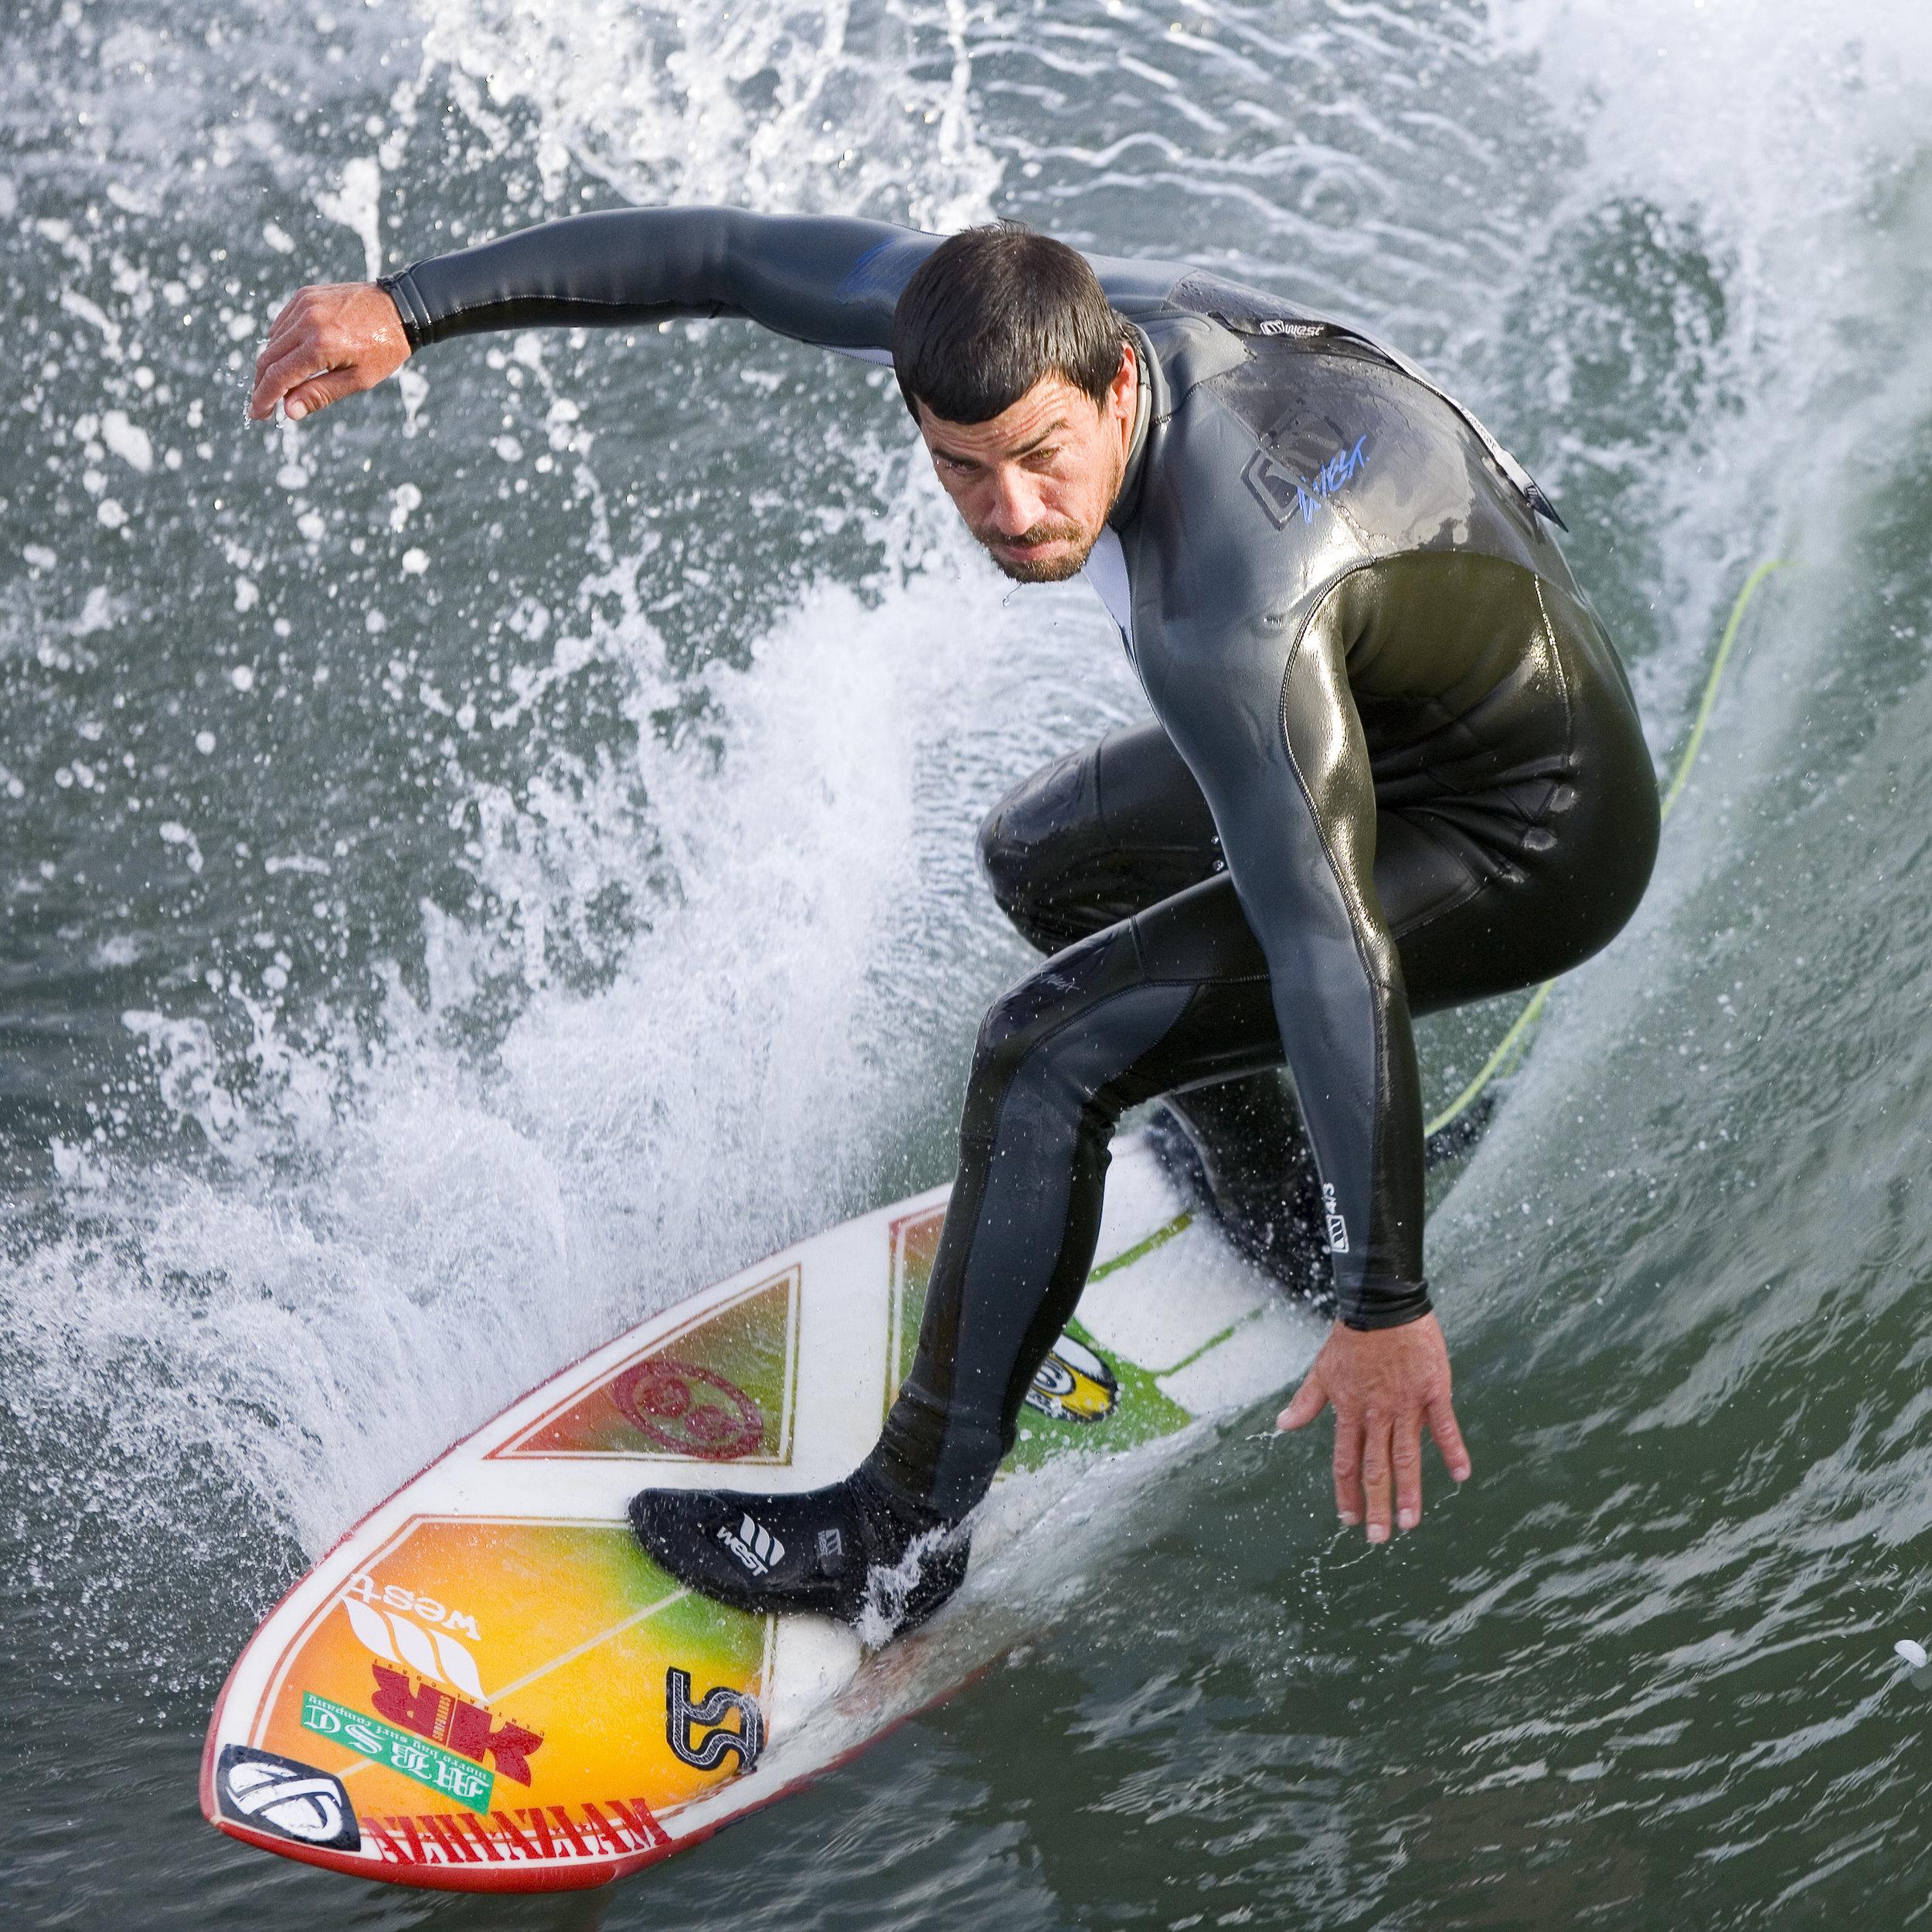 Surfer_at_the_Cayucos_Pier,_Cayucos,_CA.jpg